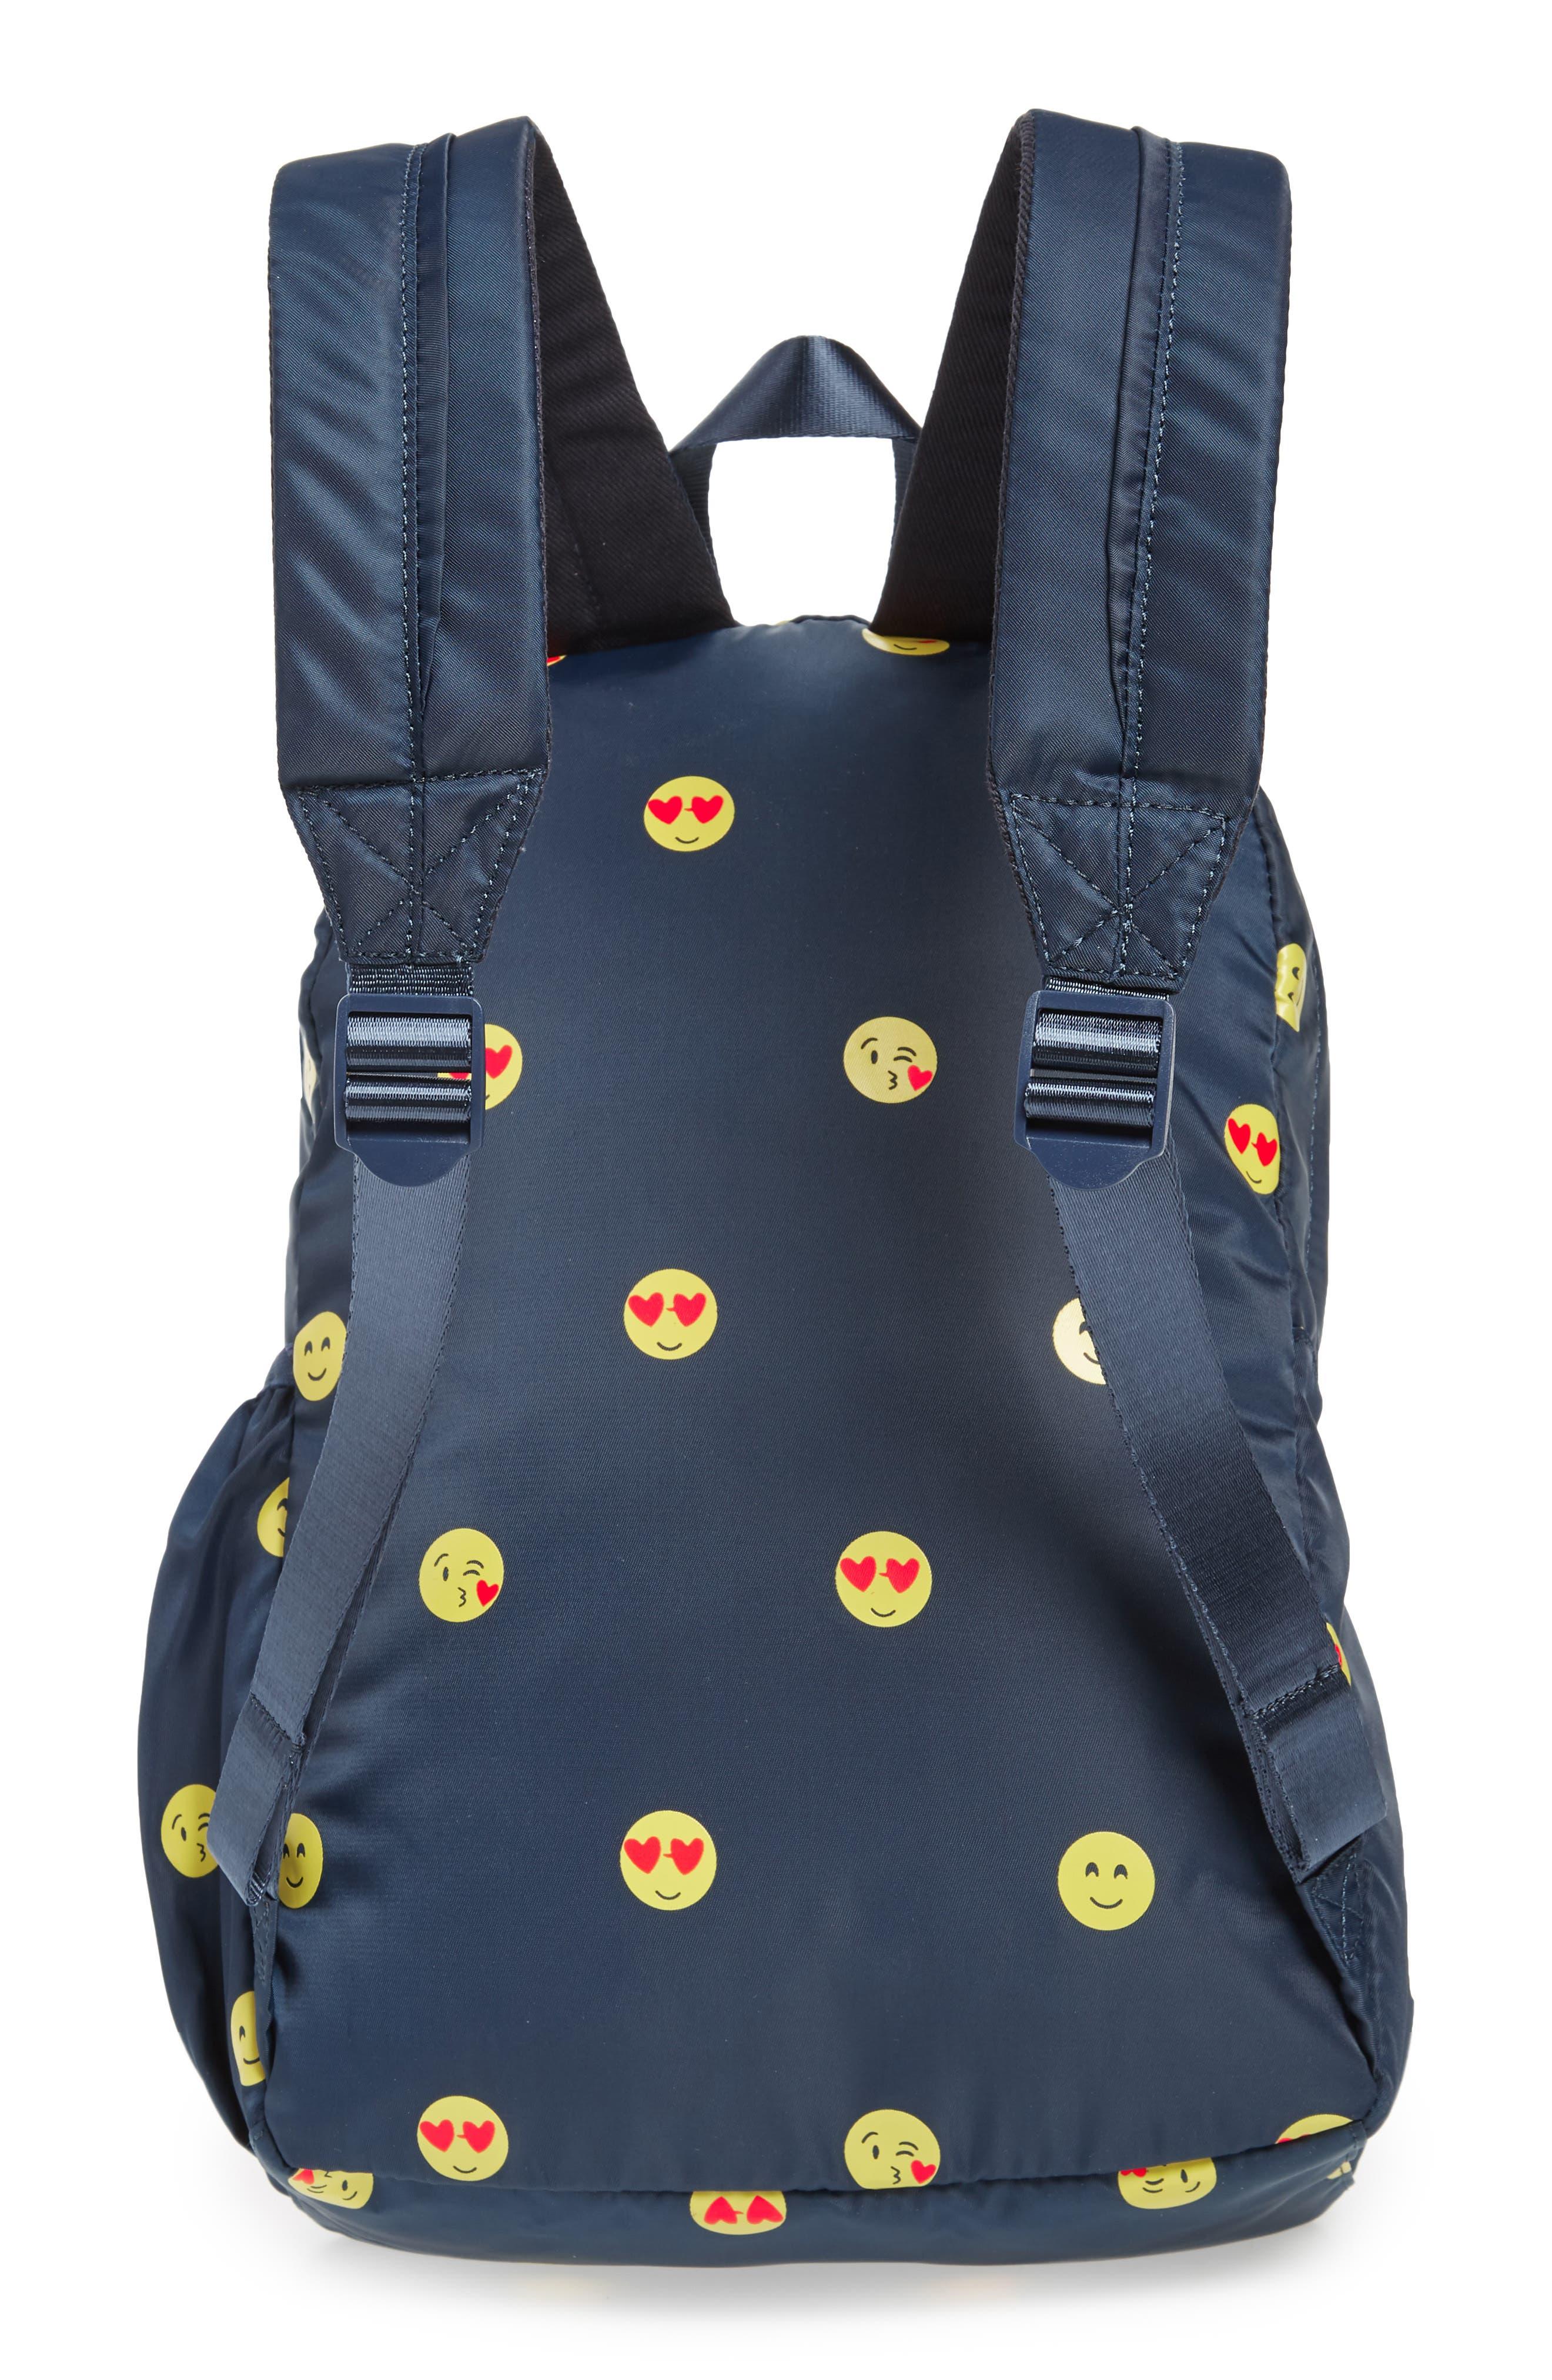 Emoji Backpack,                             Alternate thumbnail 2, color,                             NAVY